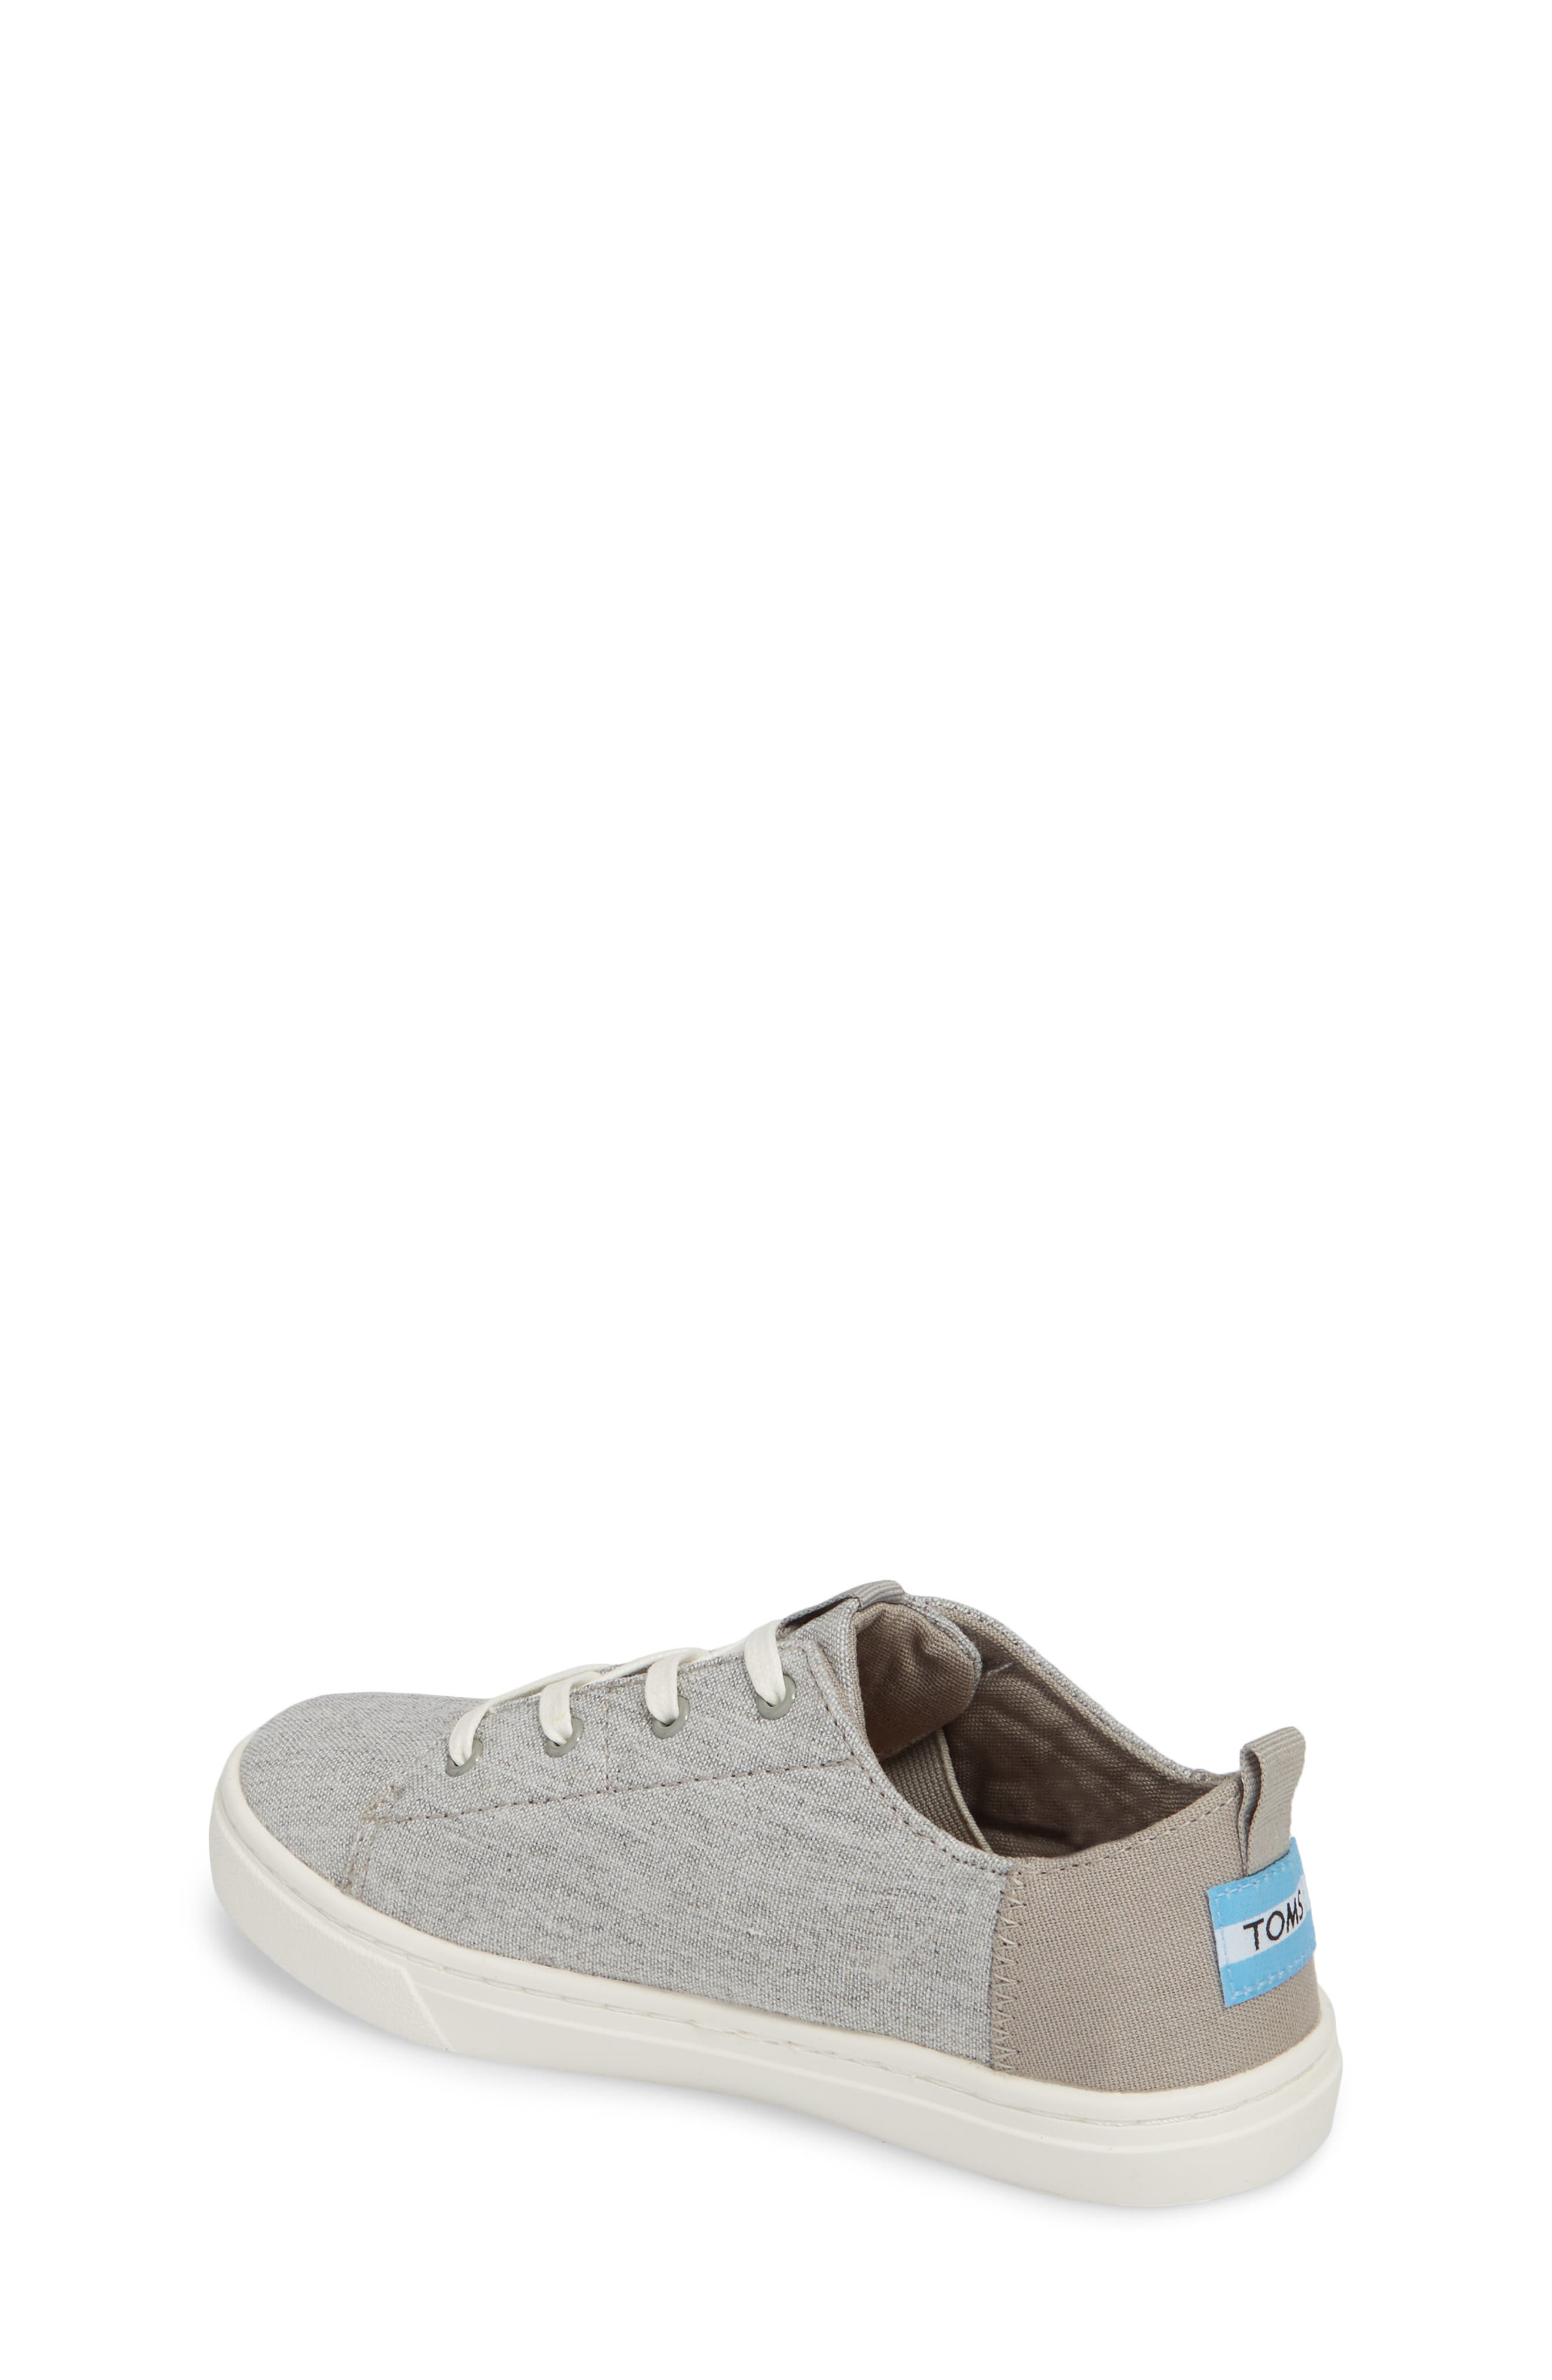 Lenny Sneaker,                             Alternate thumbnail 2, color,                             Drizzle Grey Slub Chambray